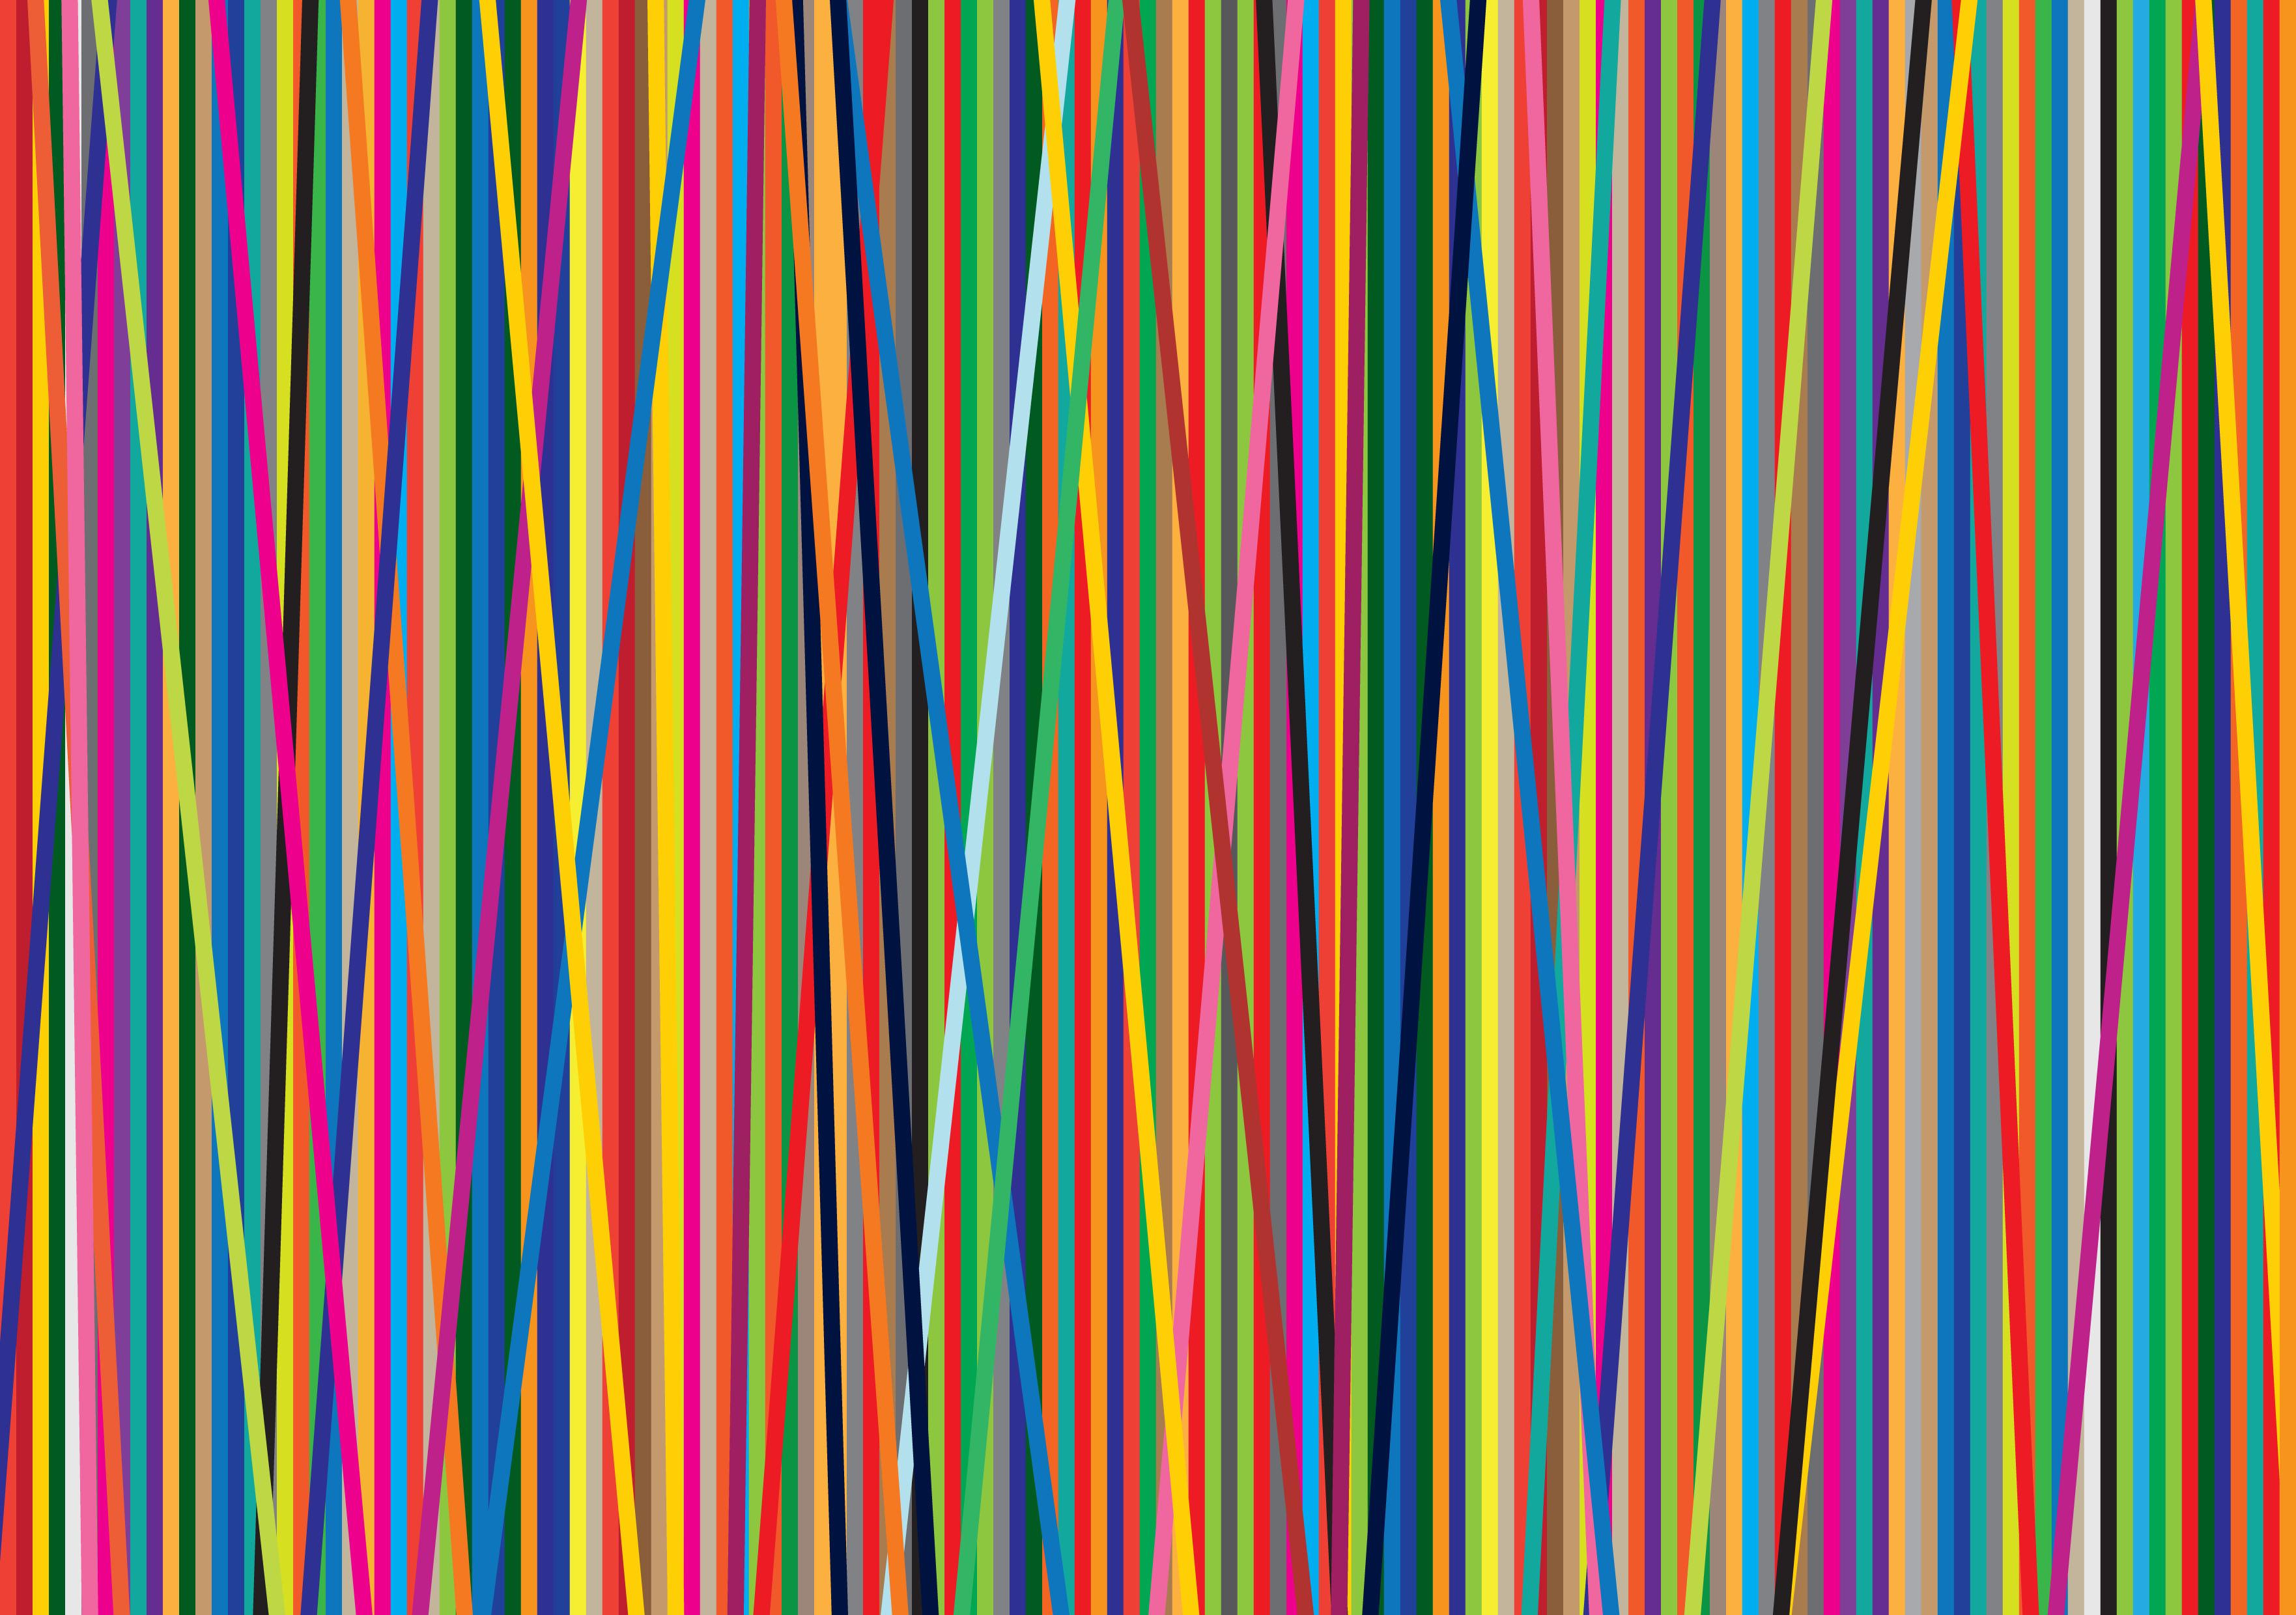 Wallpaper modern geometric patterns 3525x2480